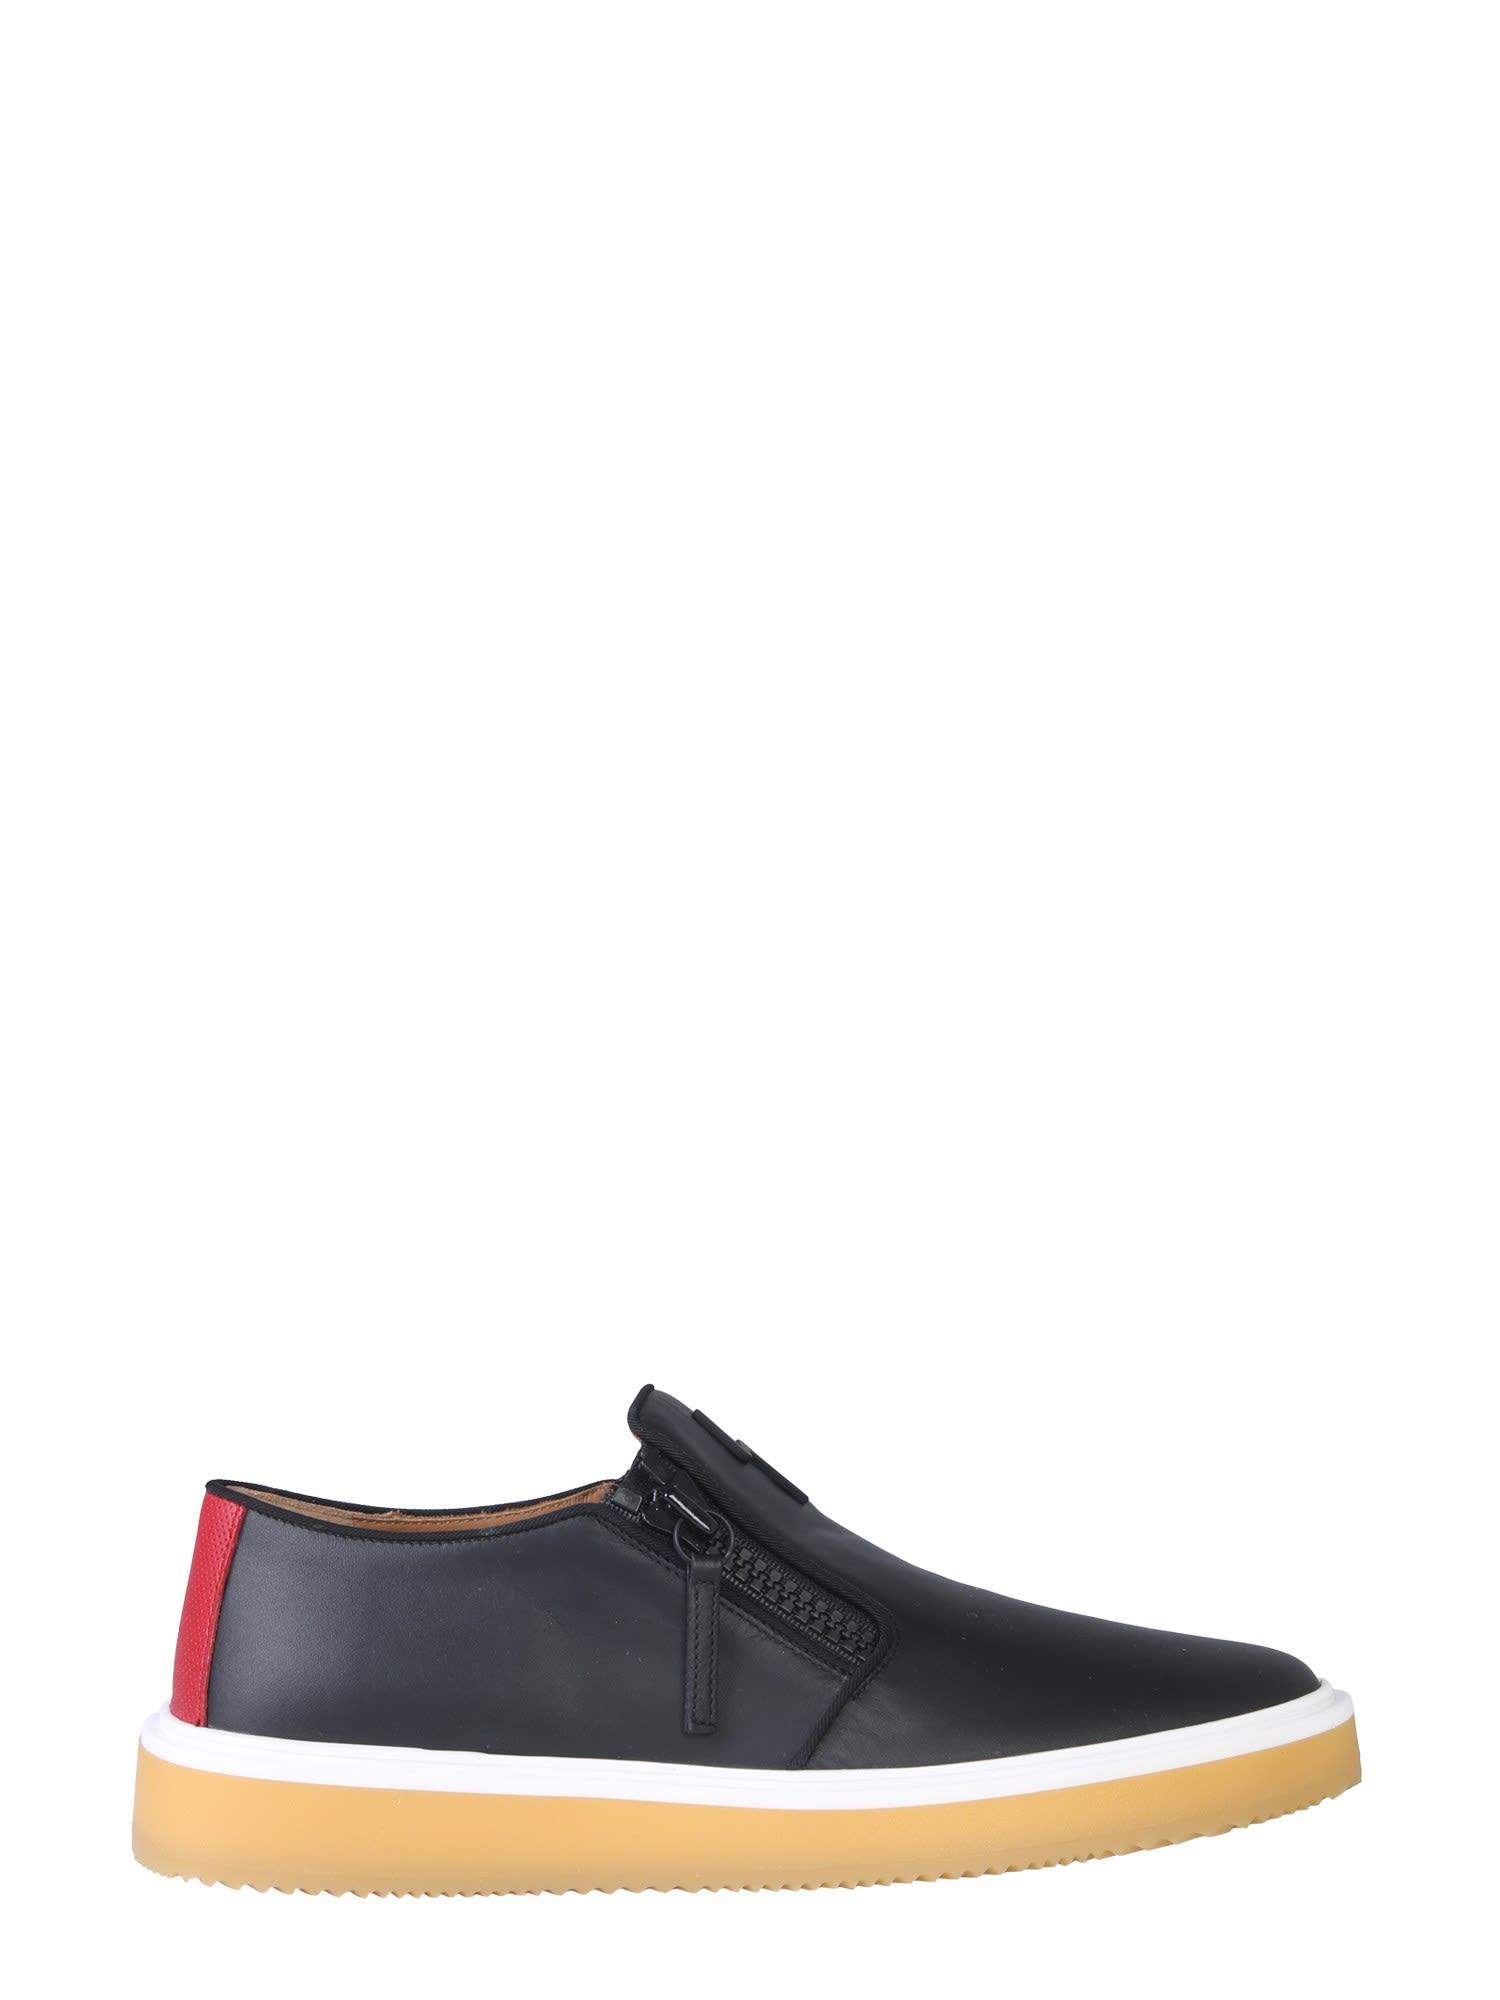 Giuseppe Zanotti Norman Sneakers